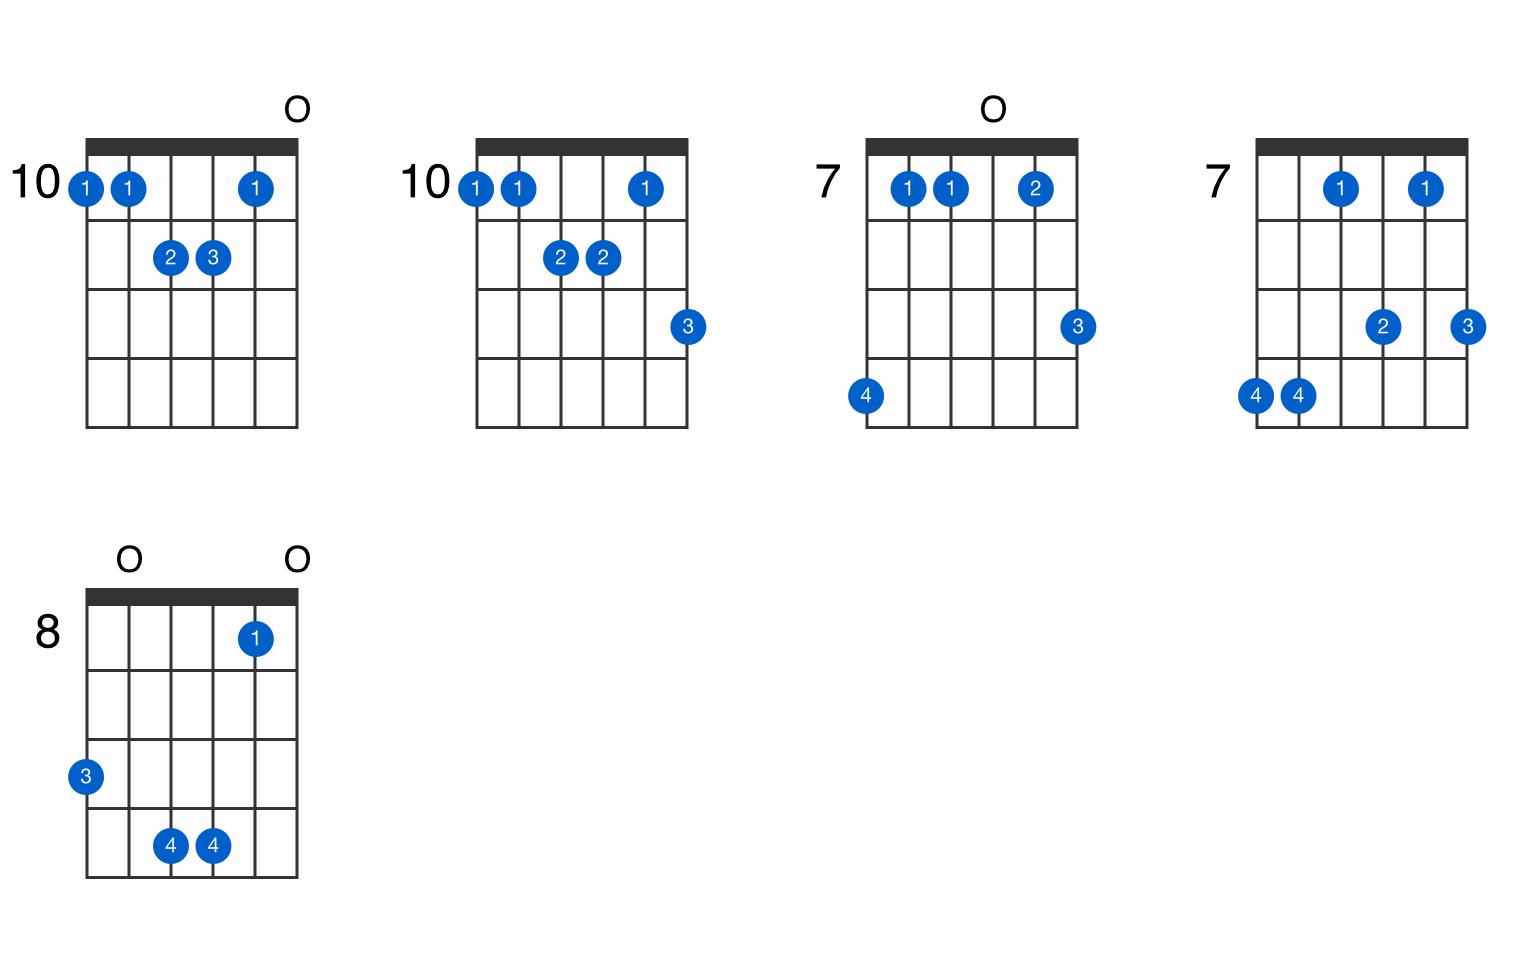 D major 15 guitar chord   GtrLib Chords